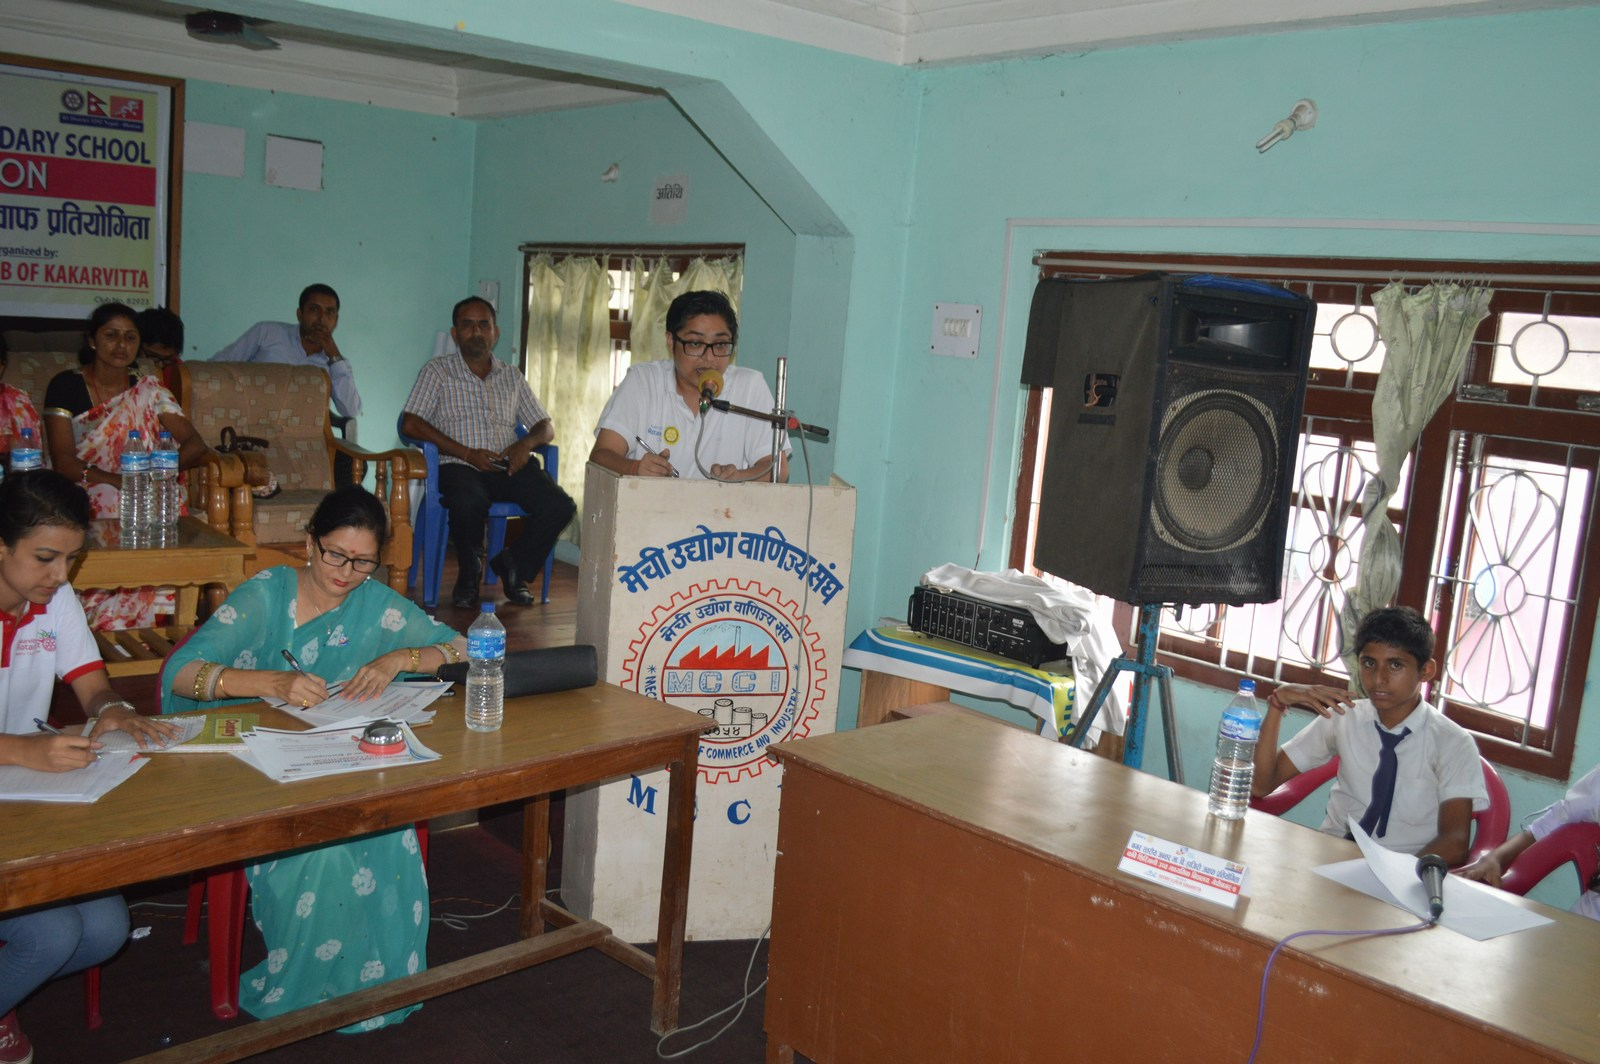 Municipality-Level-Inter-Secondary-School-Quiz-Contest-2016-Rotary-Club-of-Kakarvitta-37